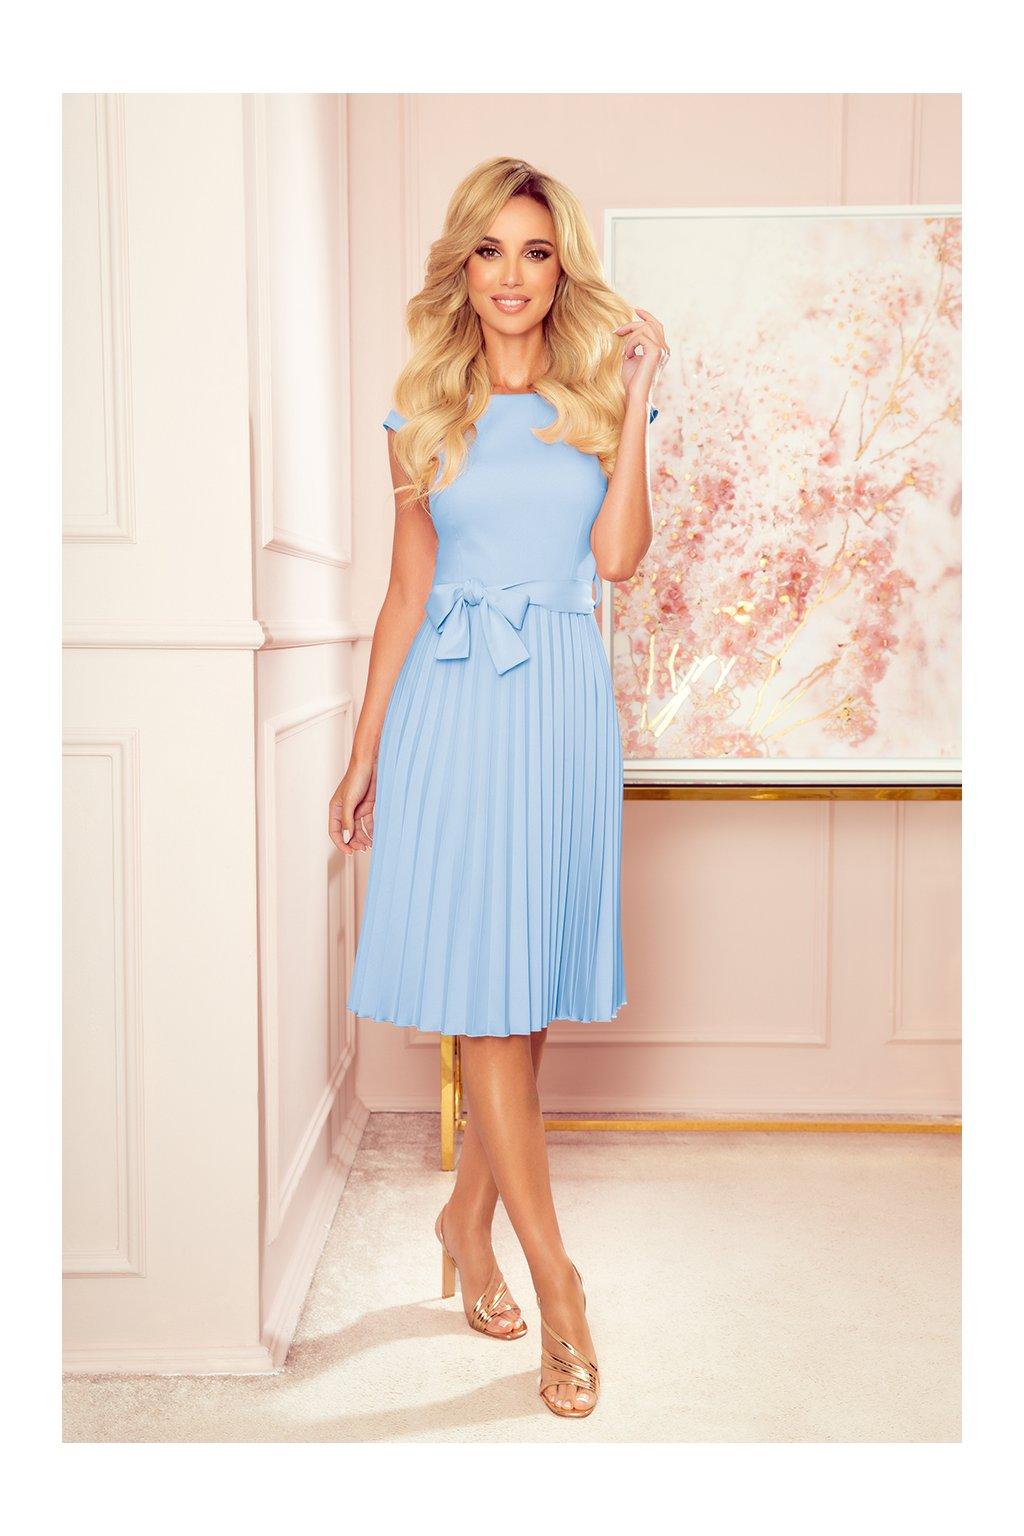 311 8 lila plisowana sukienka 12207